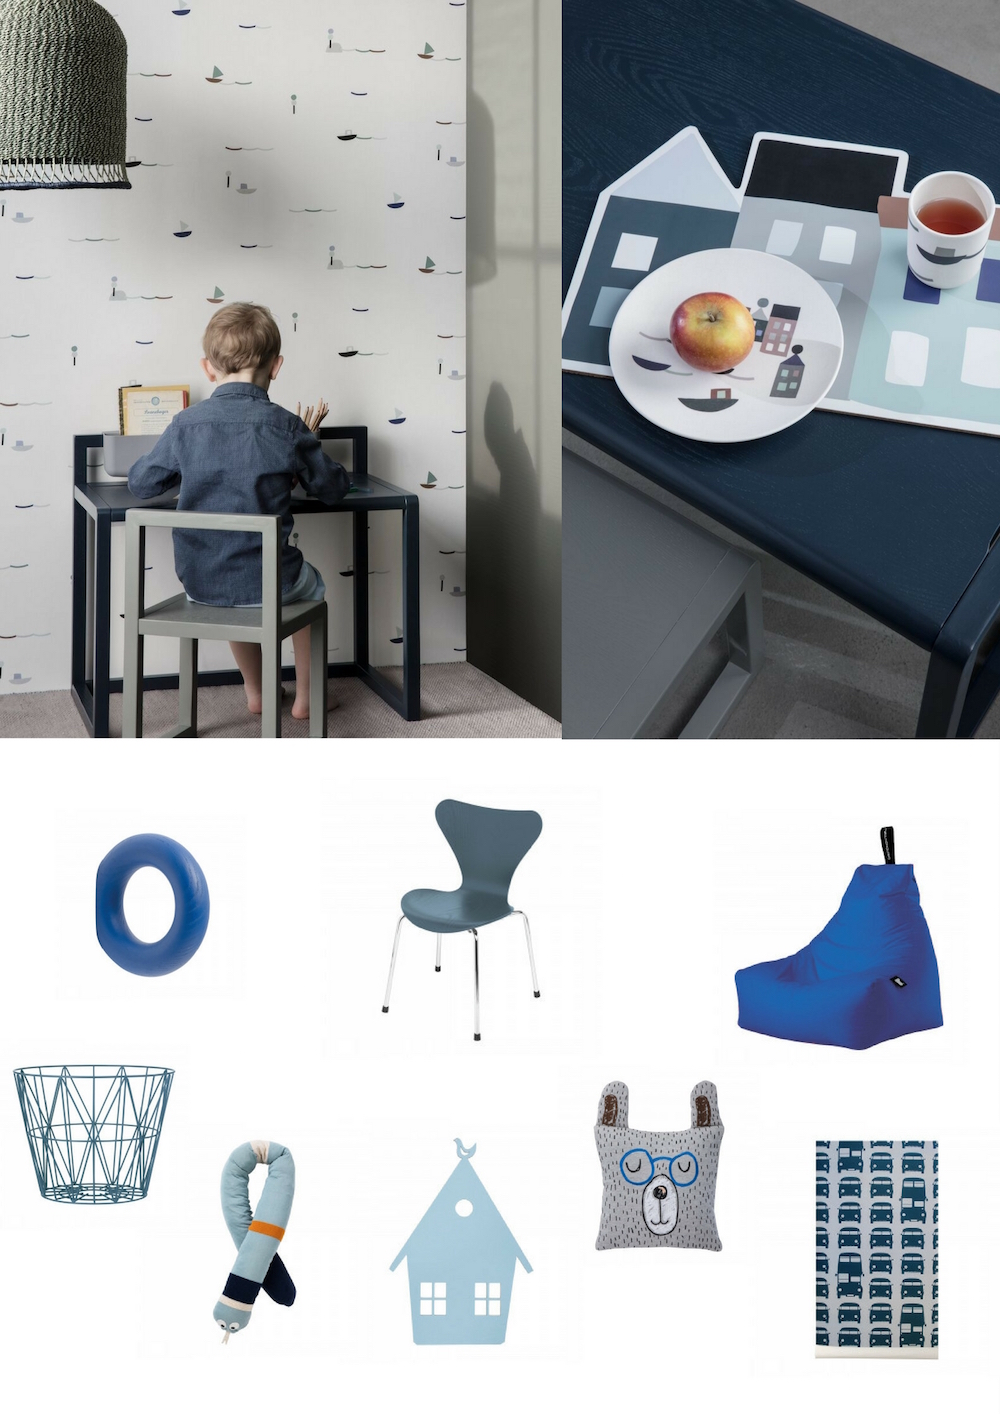 Kinderkamer Accessoires Blauw | CITYOM.nl 2